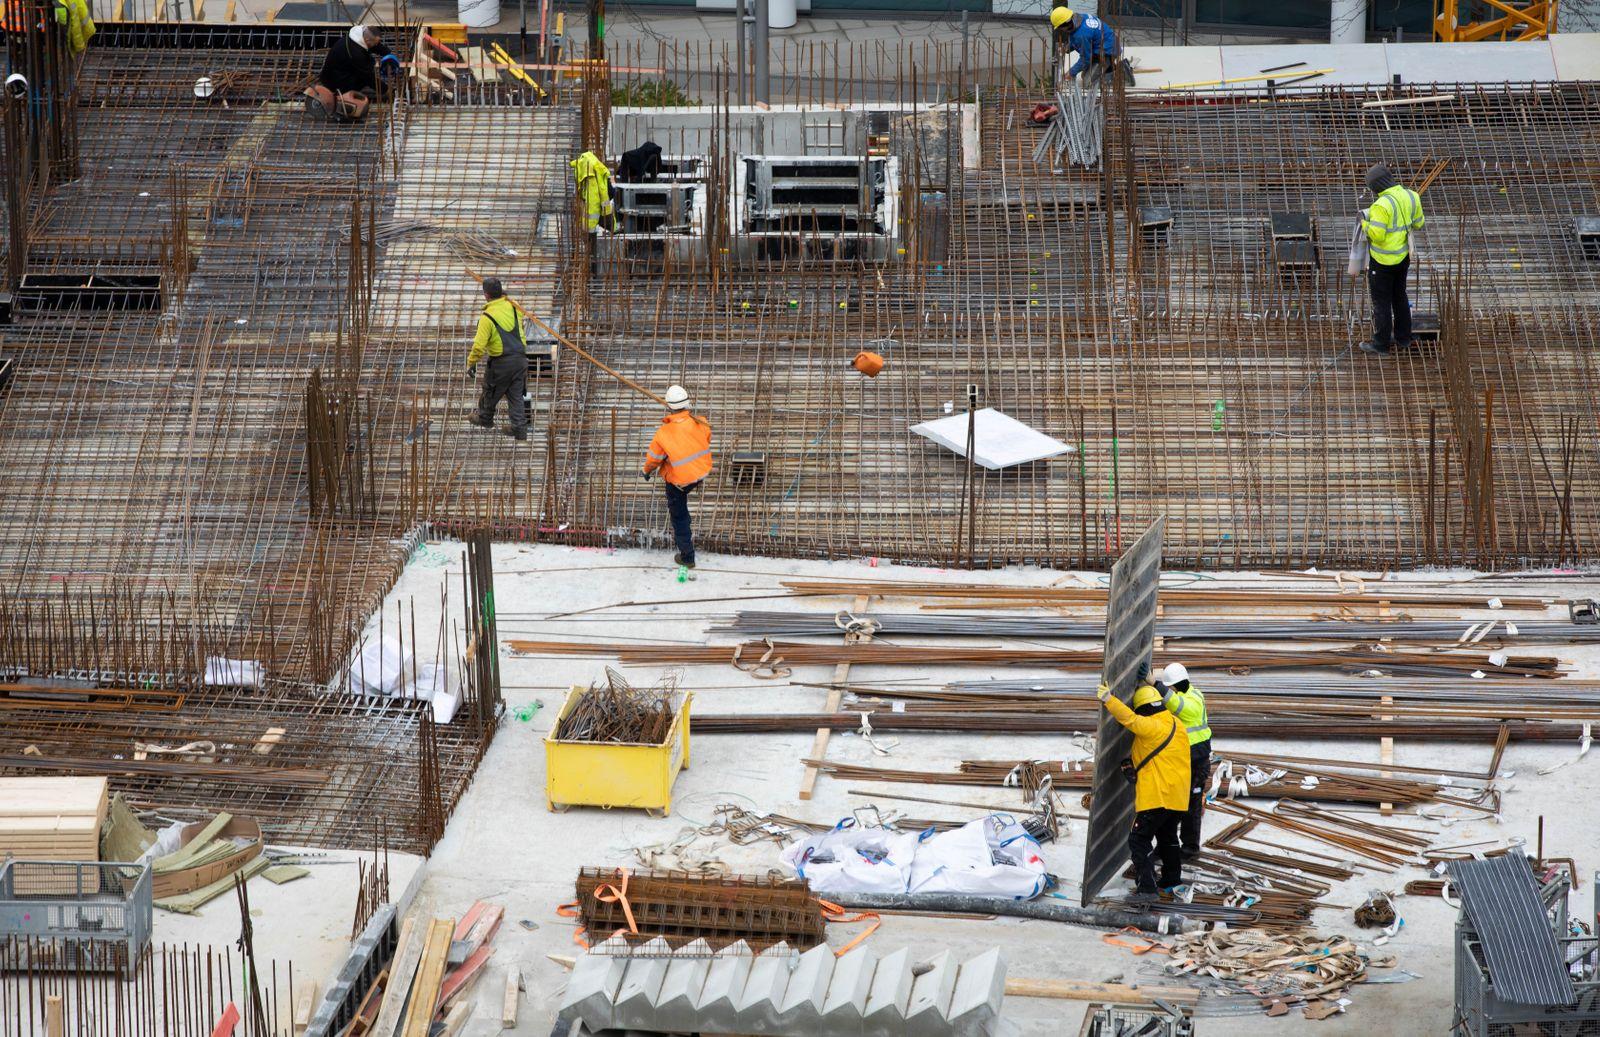 Weiterhin stabiler Auftragseingang beim Bauhauptgewerbe